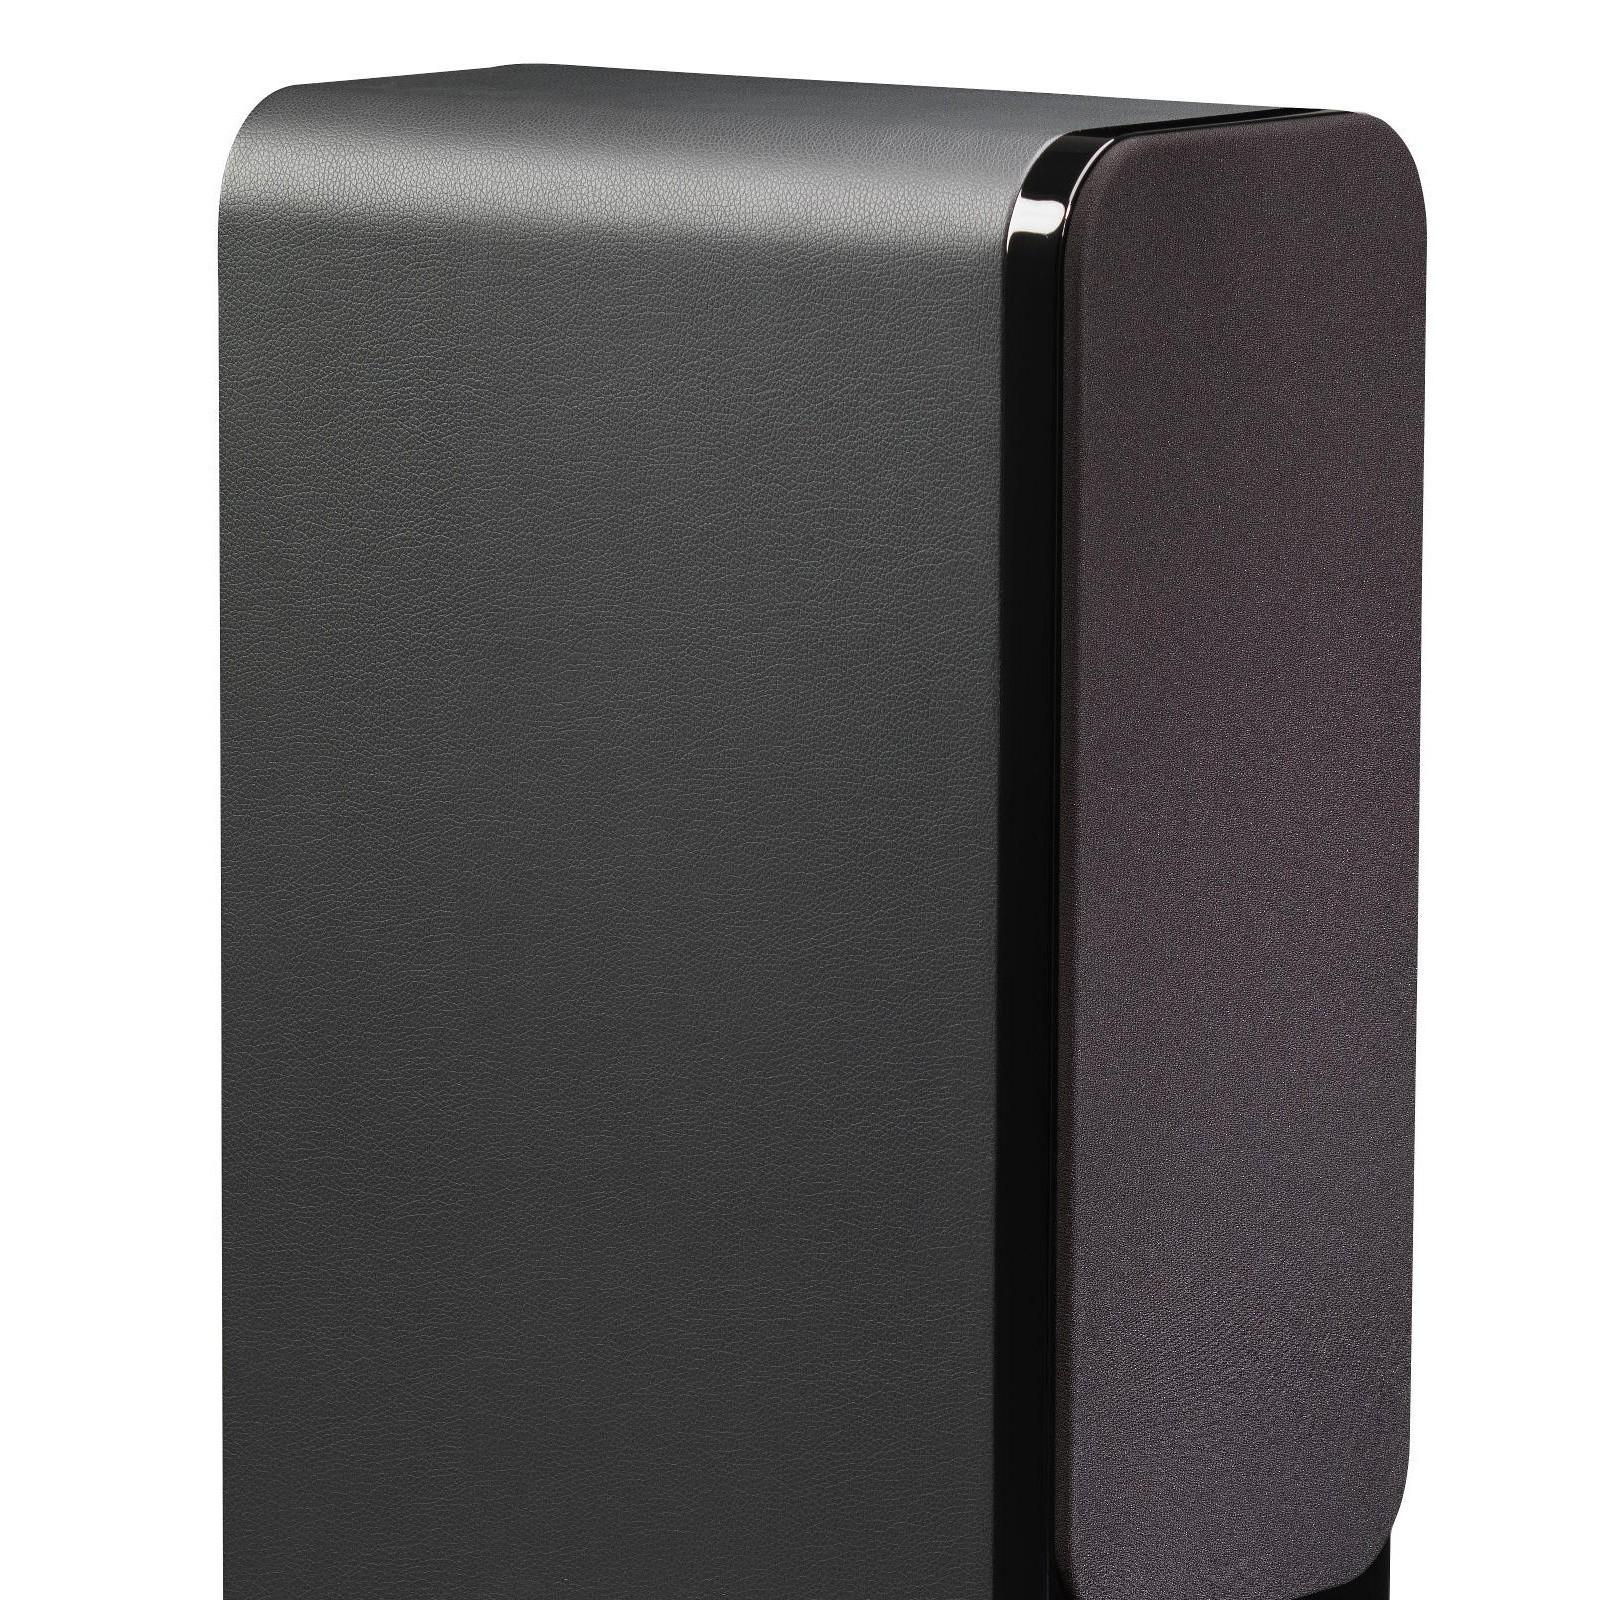 Q Acoustics 3050 has nice design and aesthetics